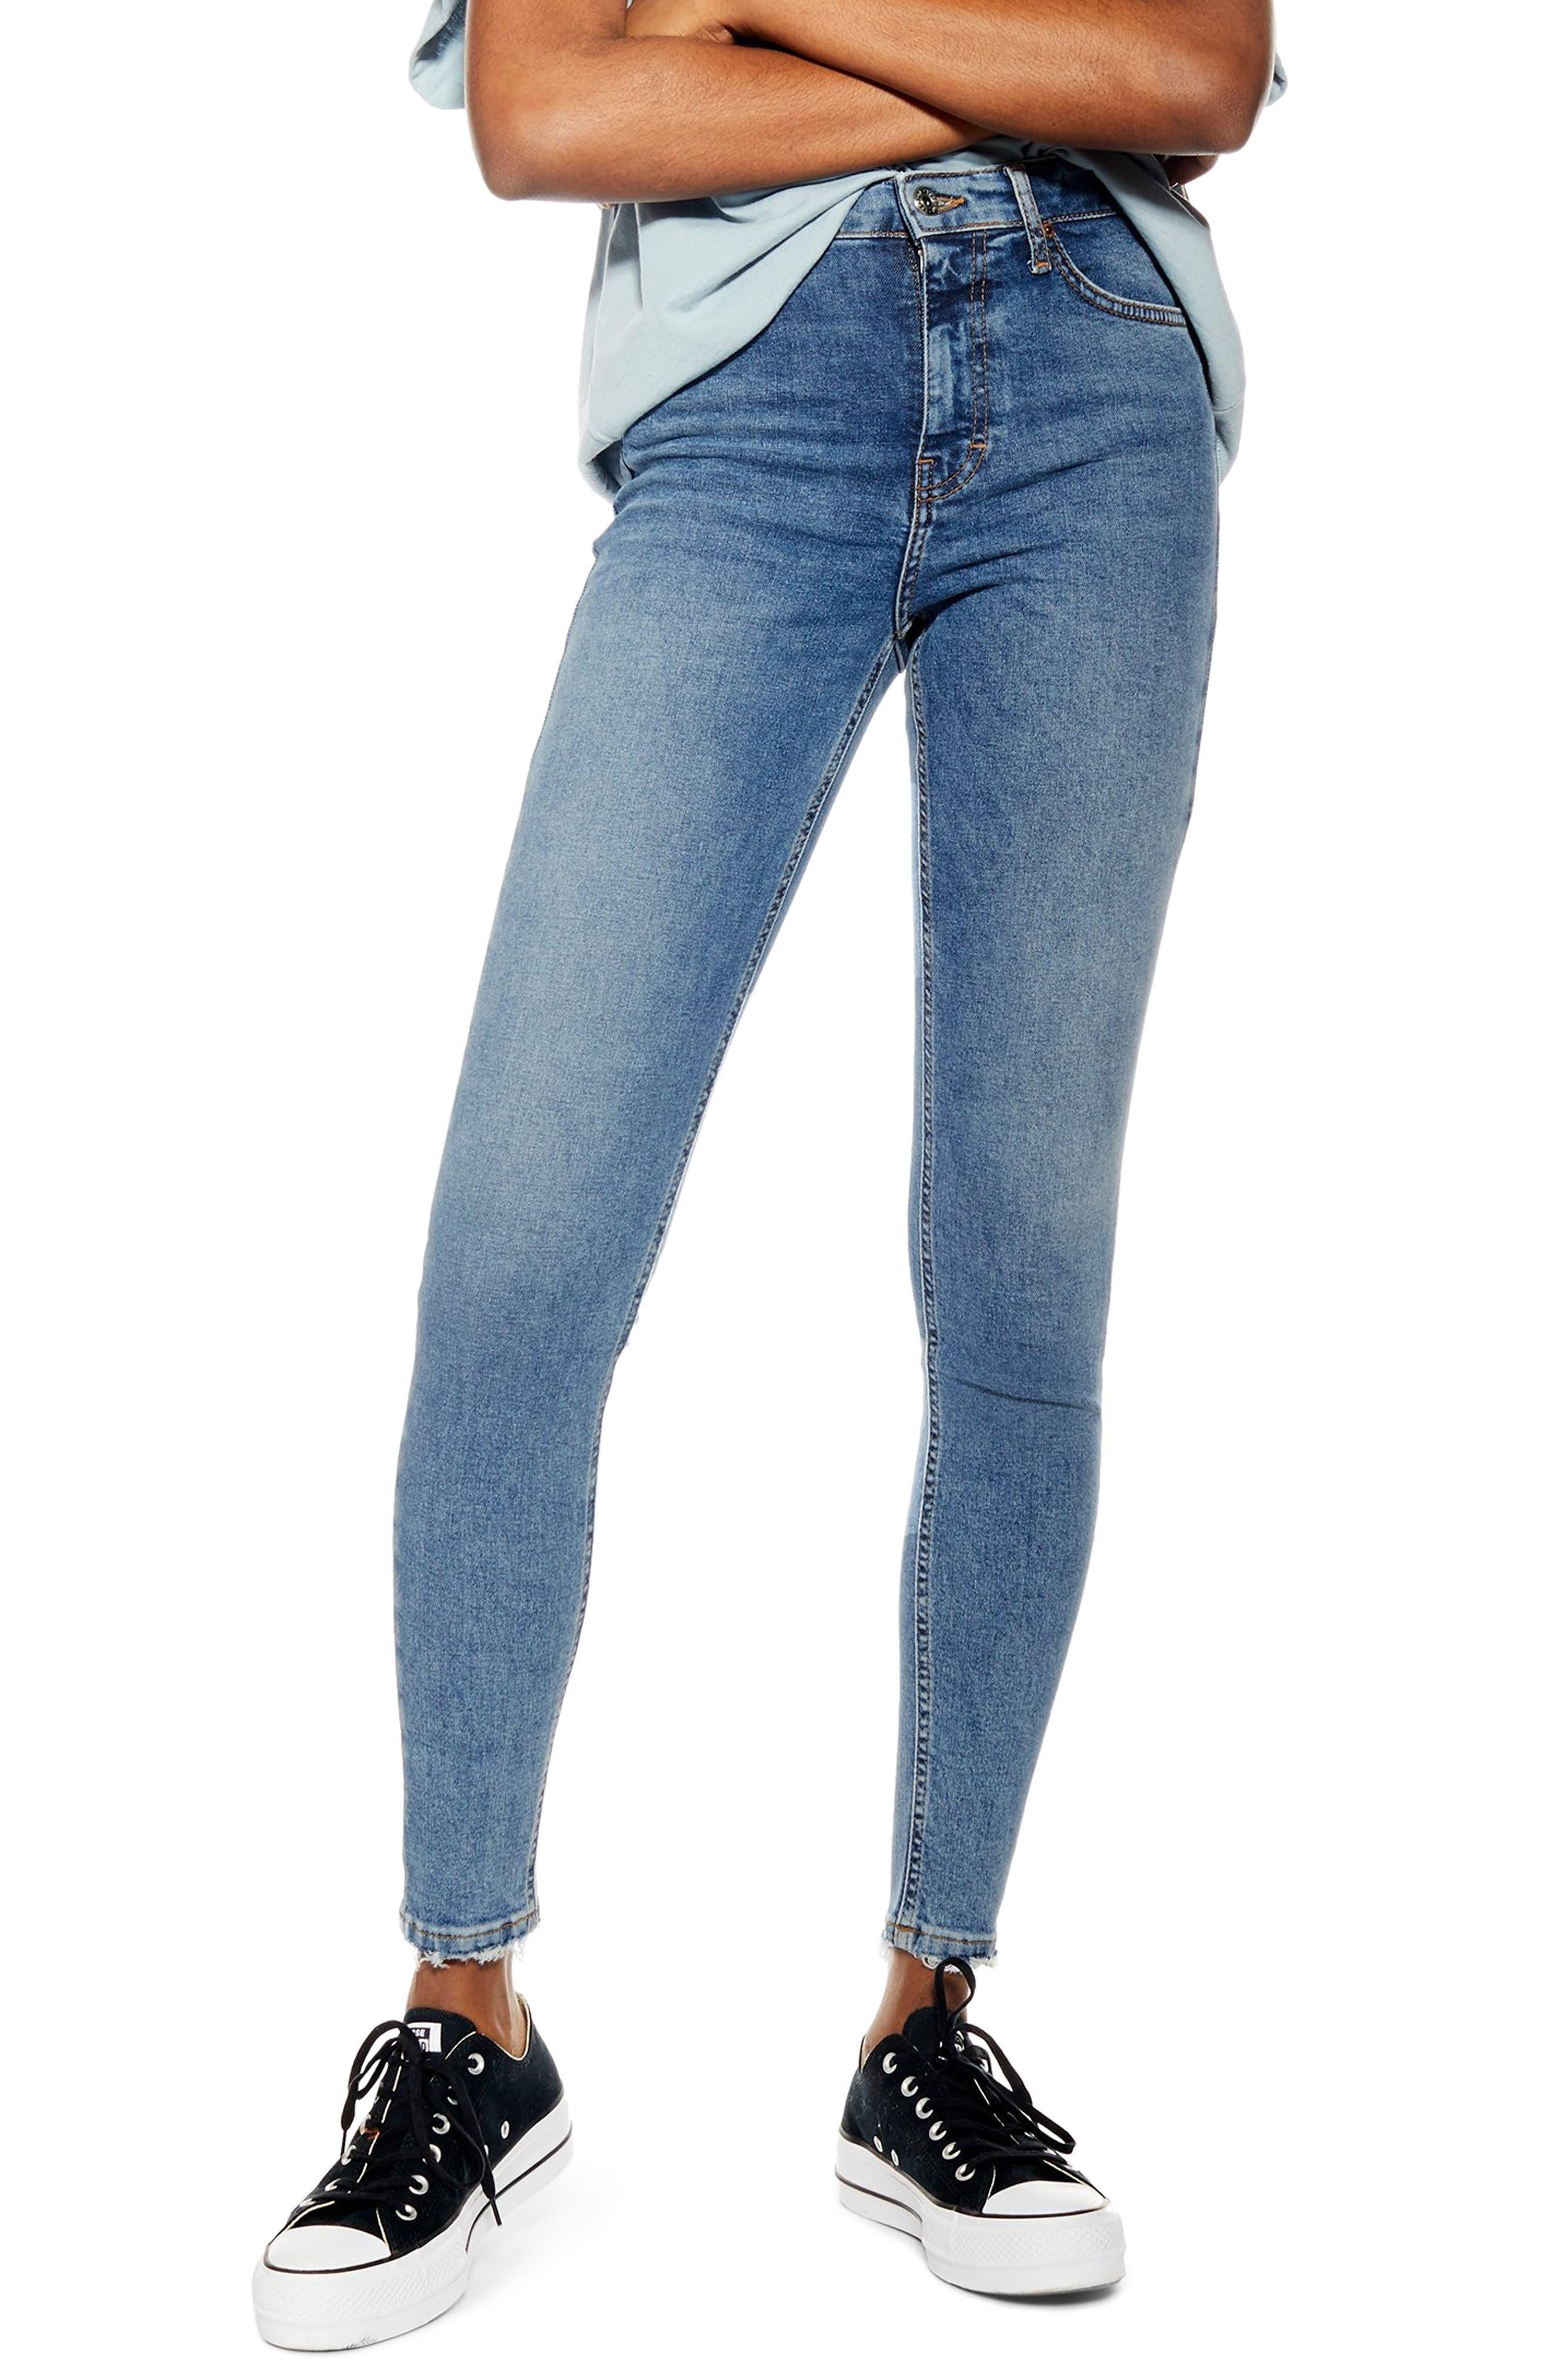 Petite Women's Topshop Jamie Fray Hem High Waist Skinny Jeans,  25W x 28L (fits like 24W) - Blue